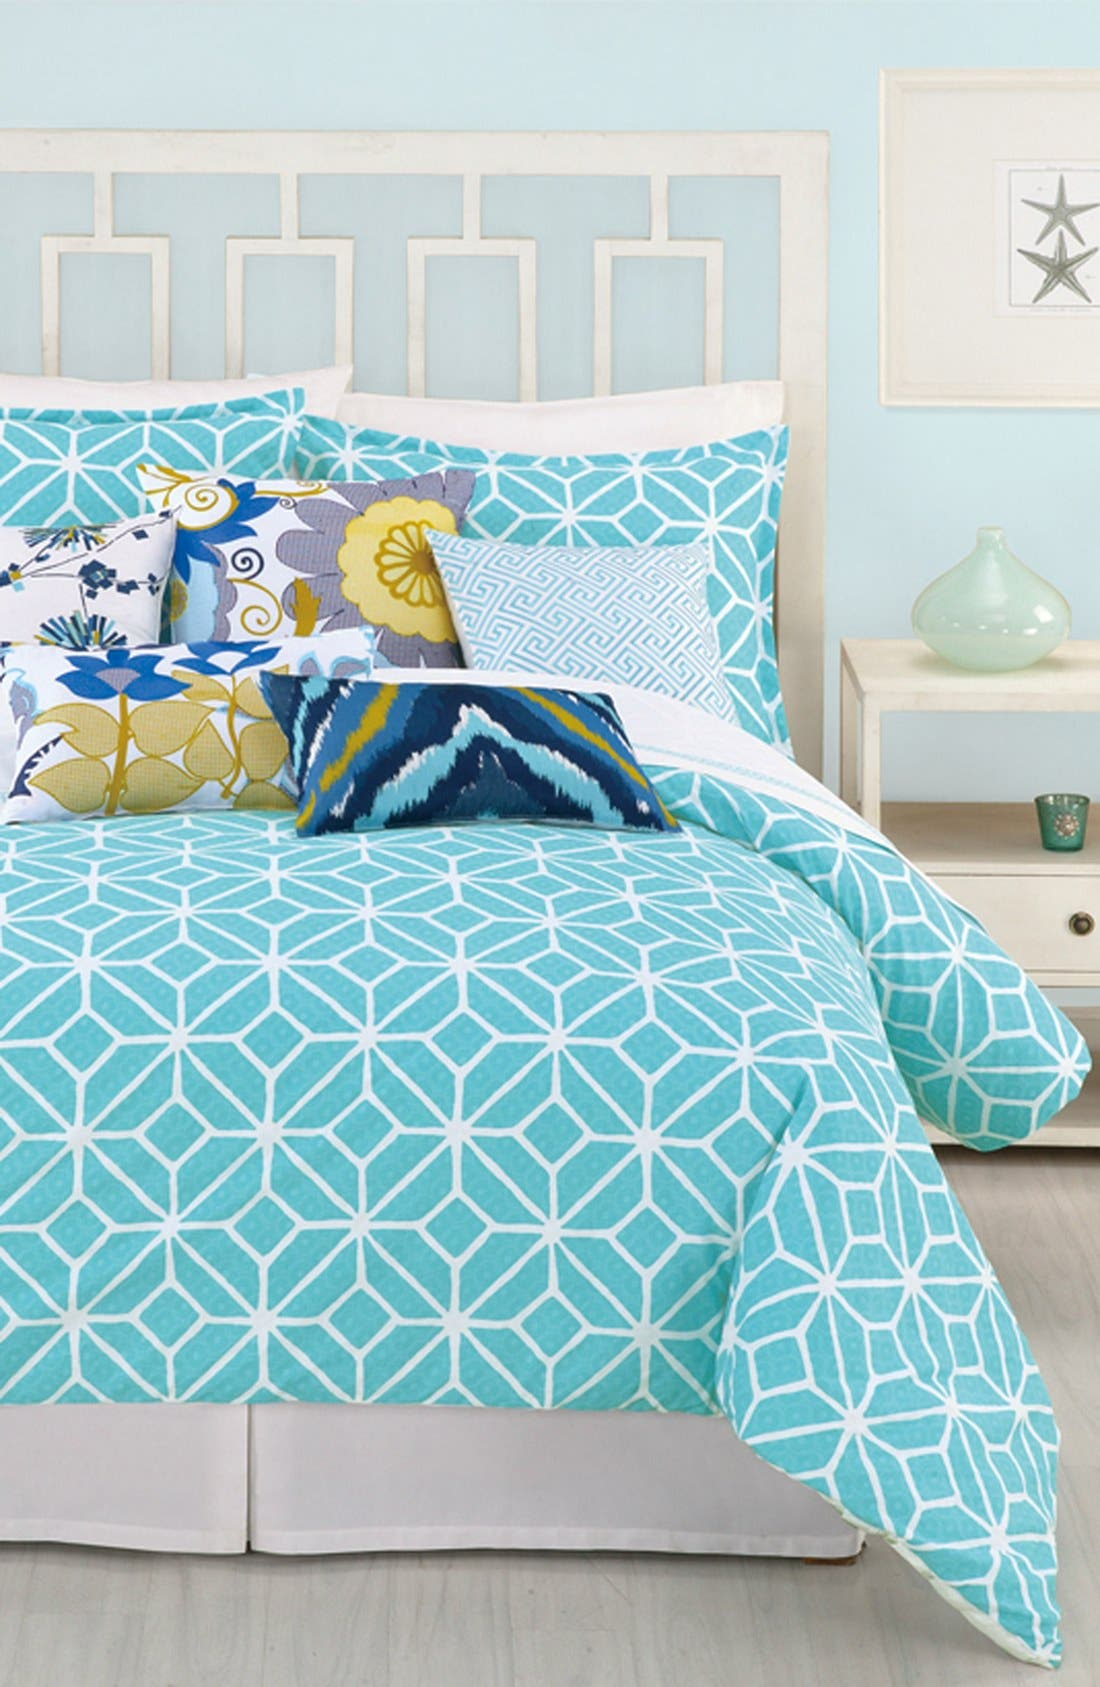 Main Image - Trina Turk 'Trellis' Twin Comforter & Shams